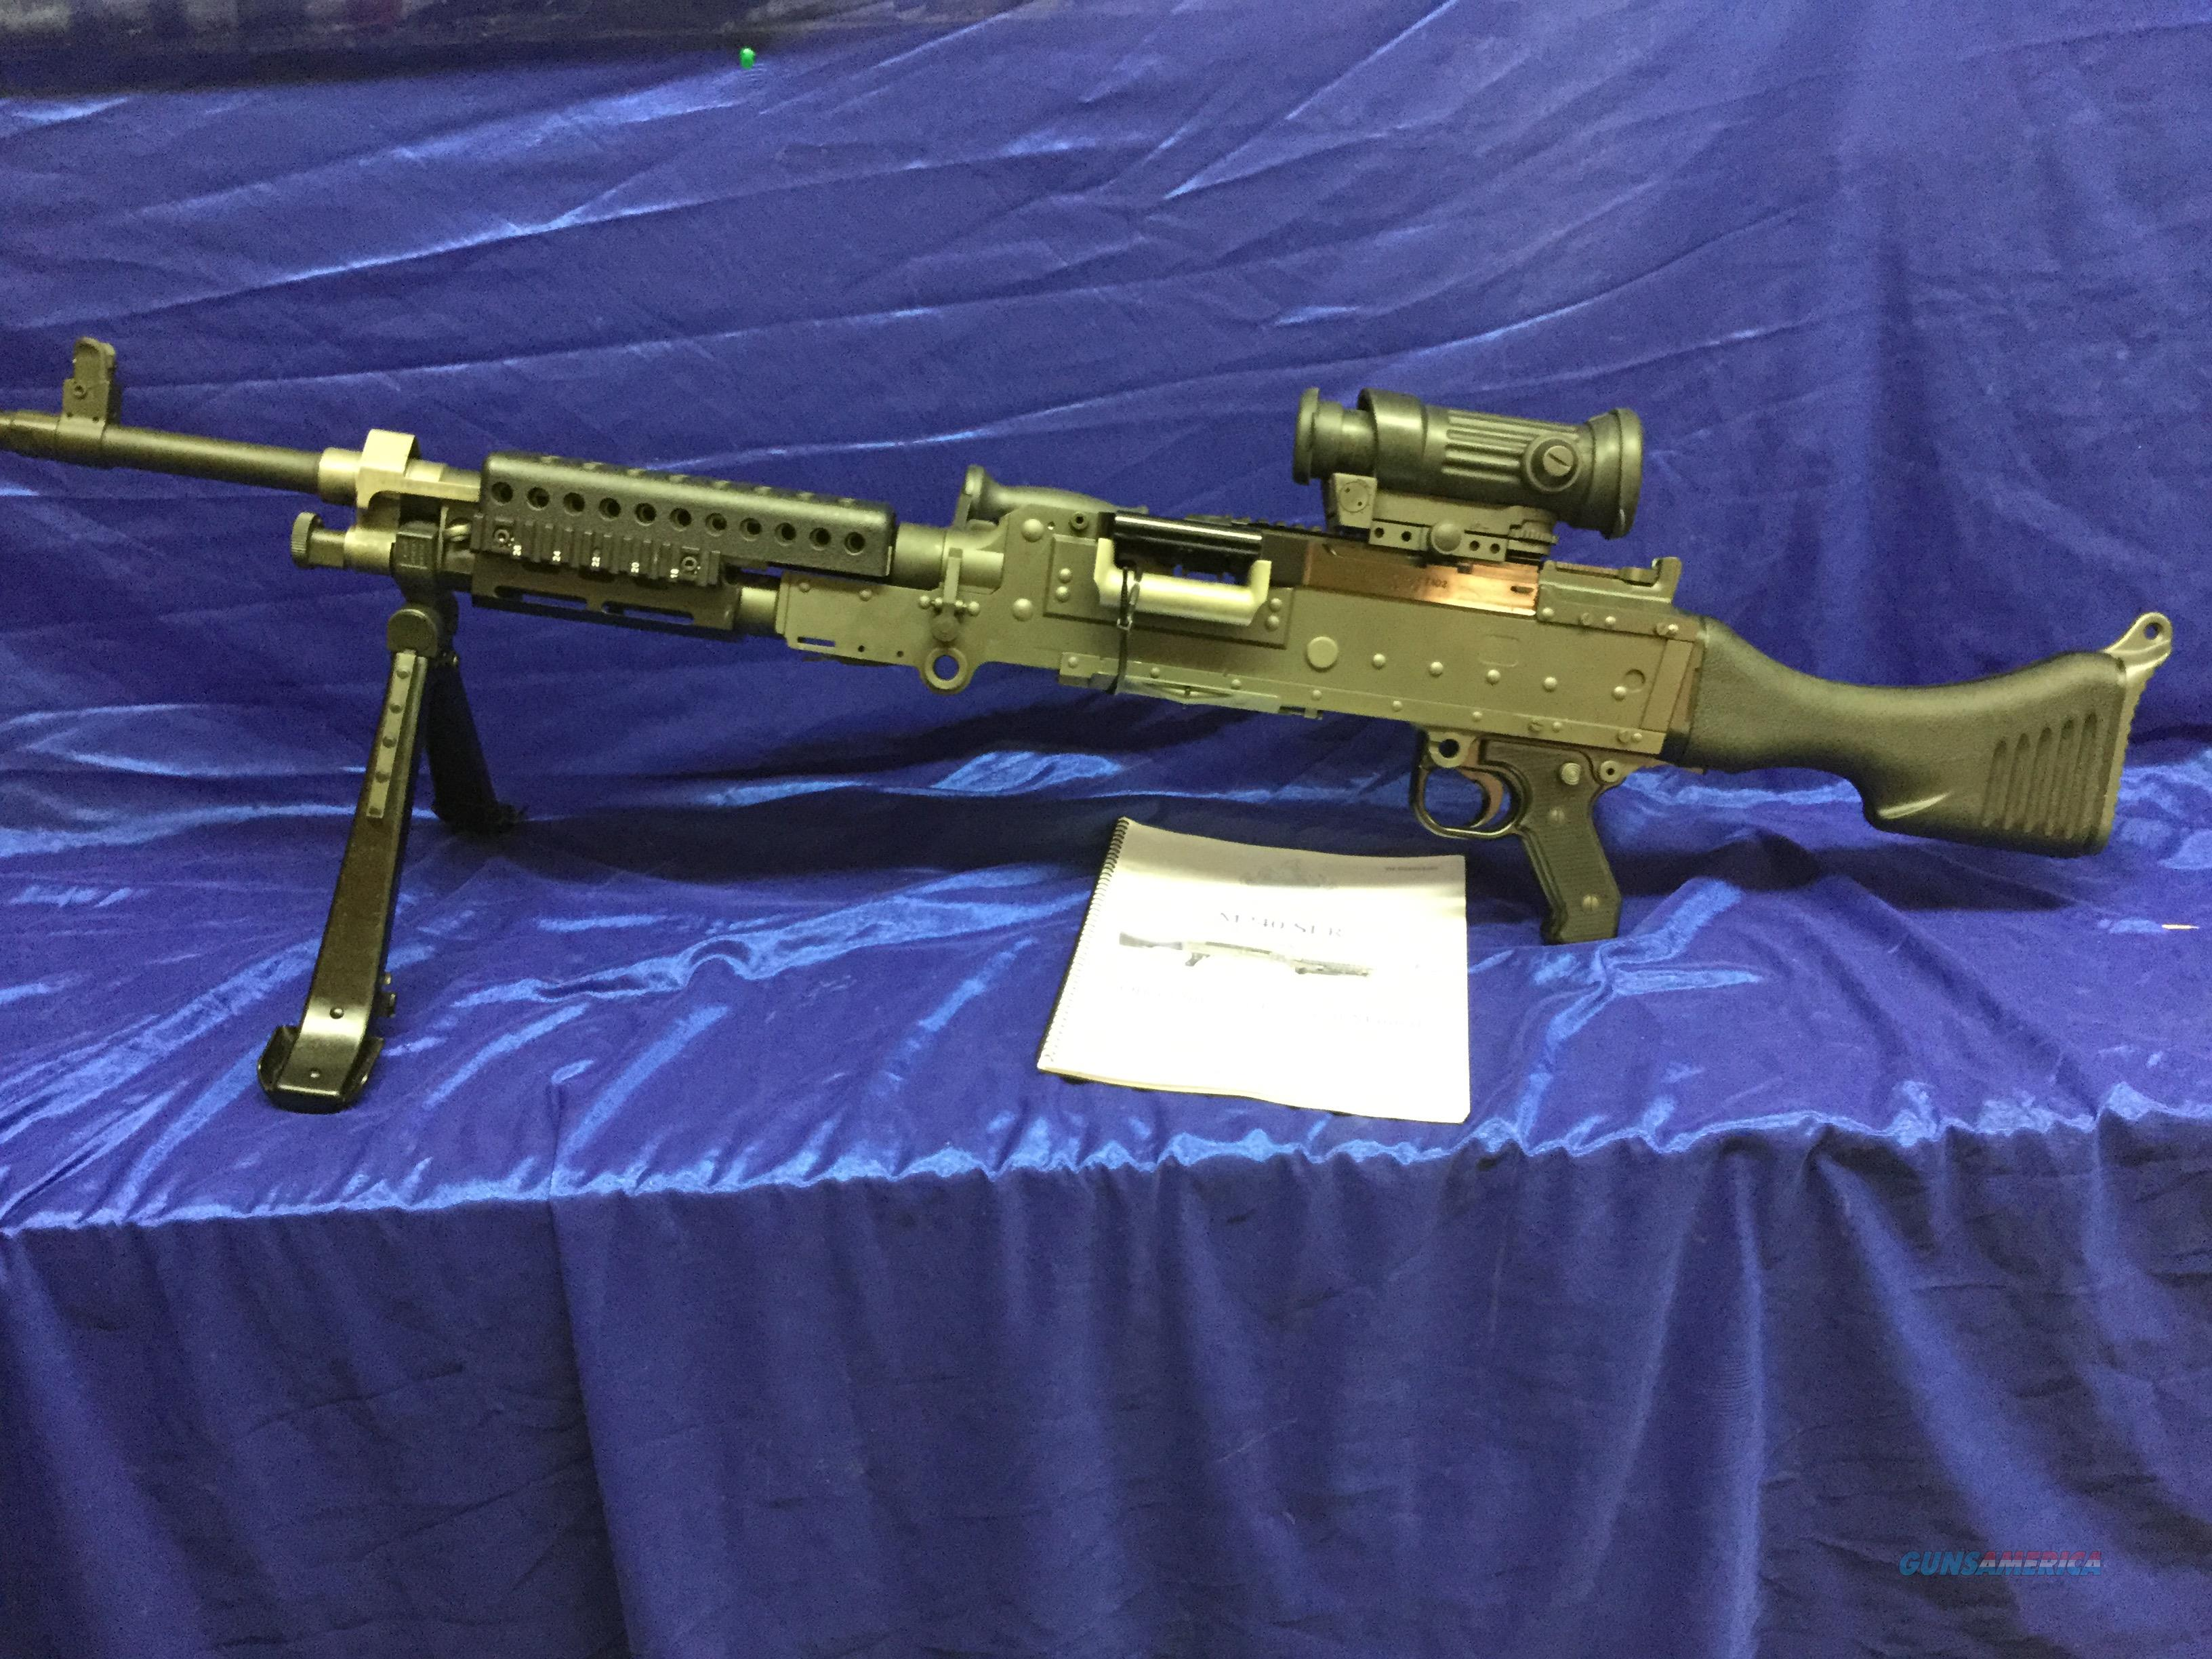 M240 SLR Ohio Ordnance Works Semi-Auto Beltfed